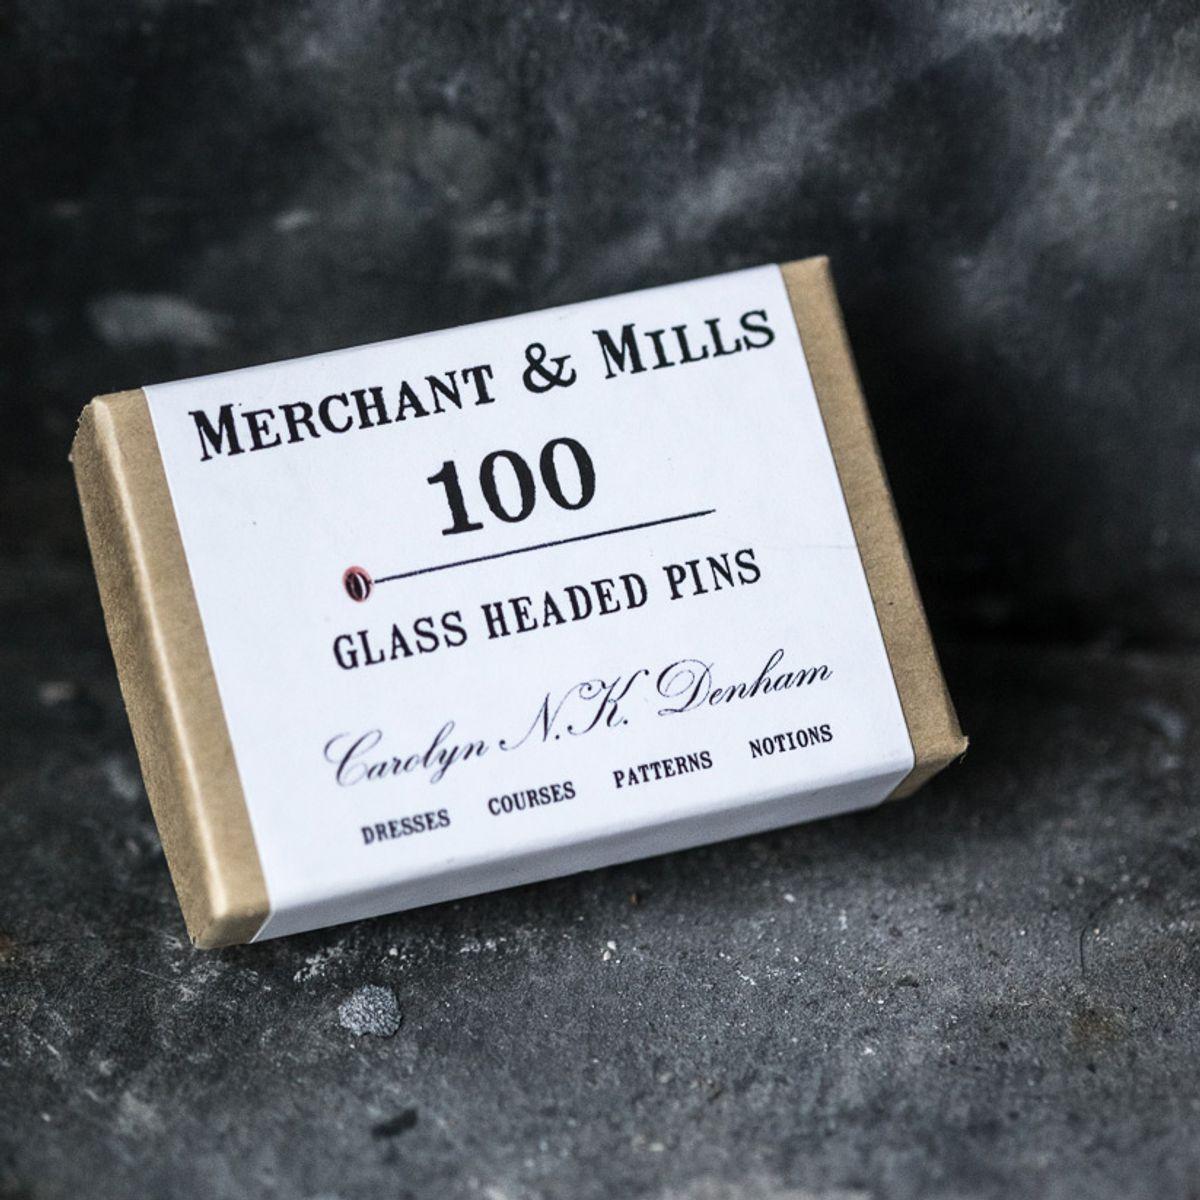 Boite de 100 épingles extra-fines tête de verre Merchant & Mills